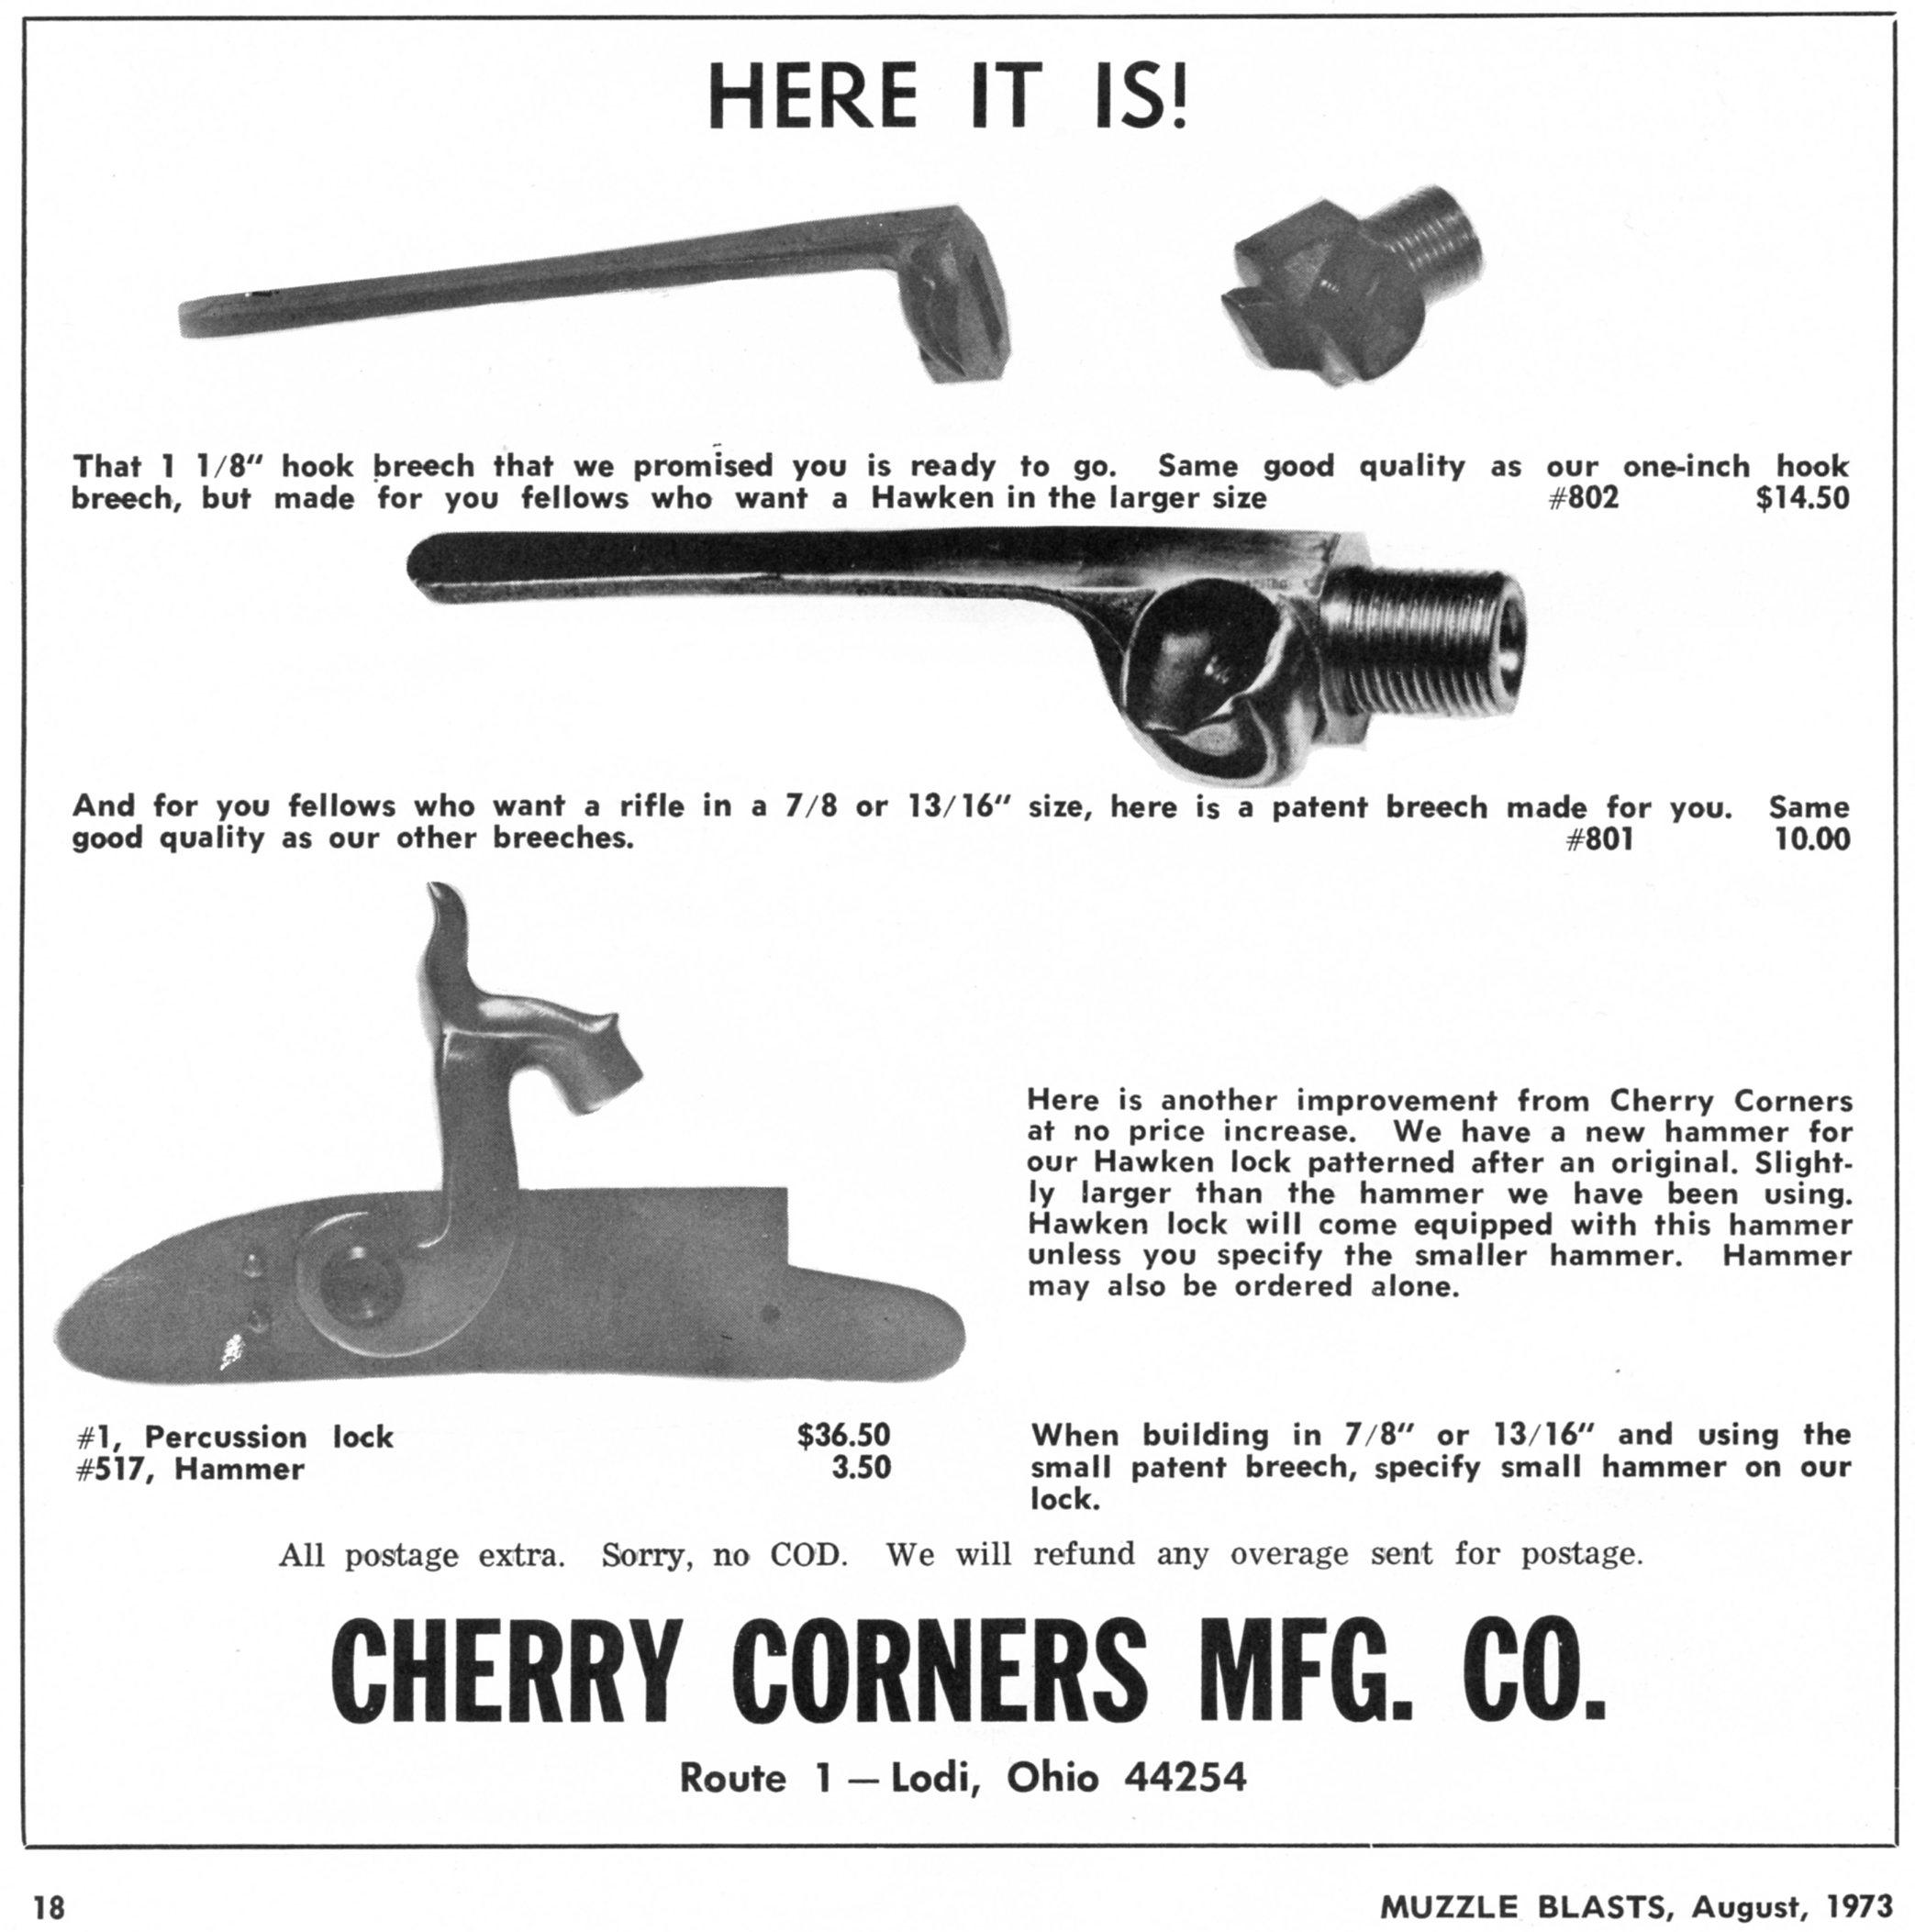 Cherry Corners 1-1/8 in hooded breech ad